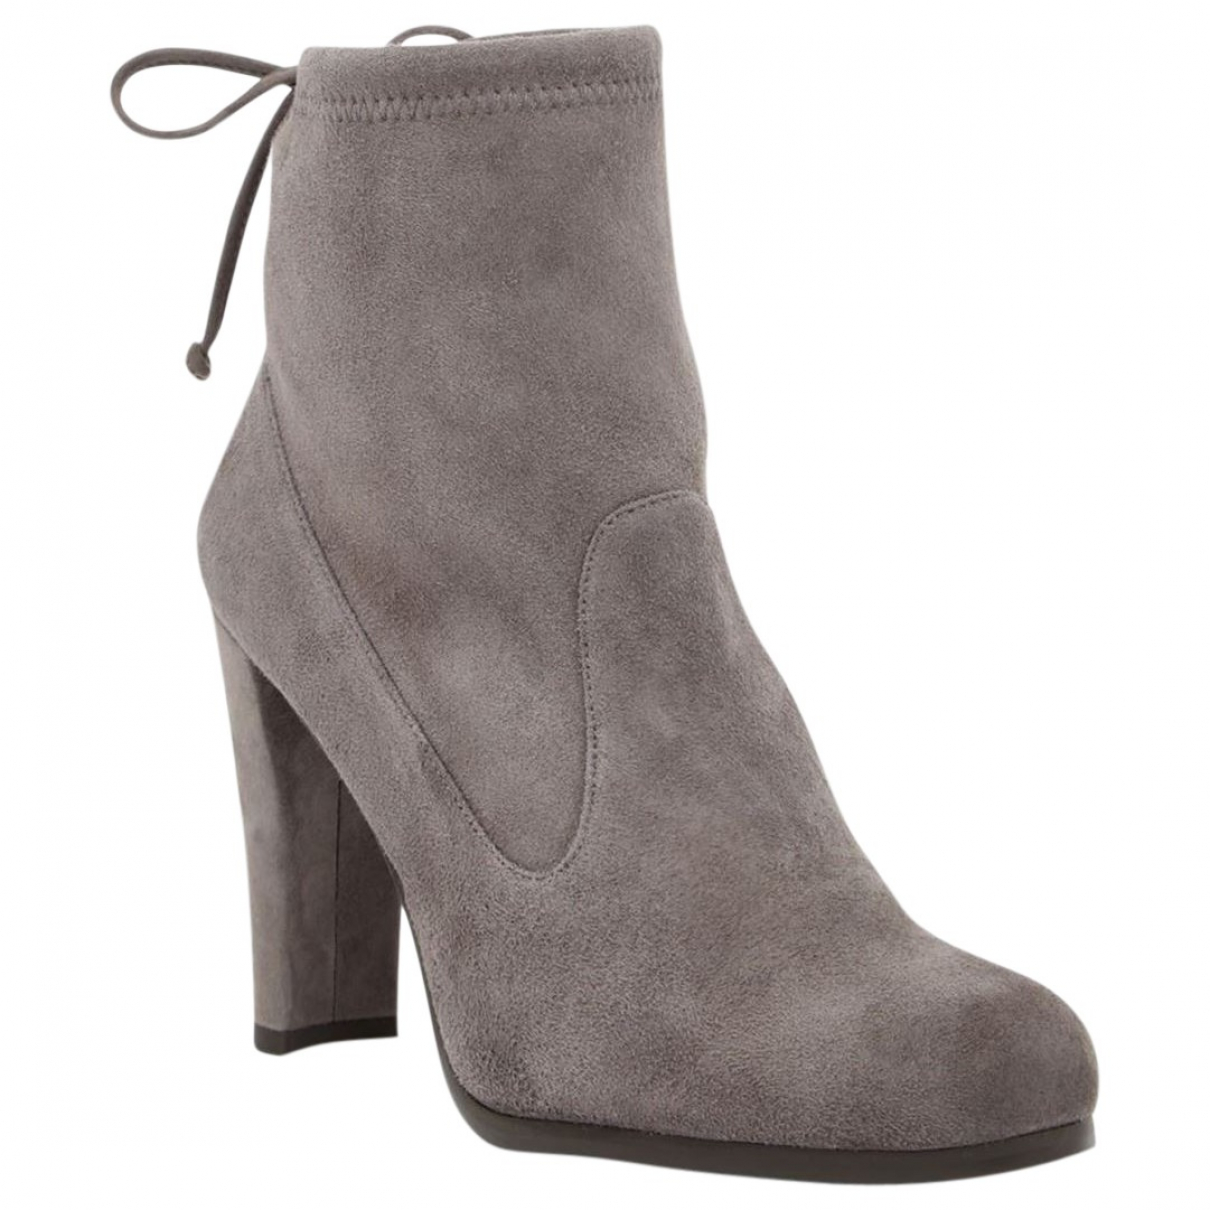 Stuart Weitzman N Grey Suede Ankle boots for Women 39.5 EU